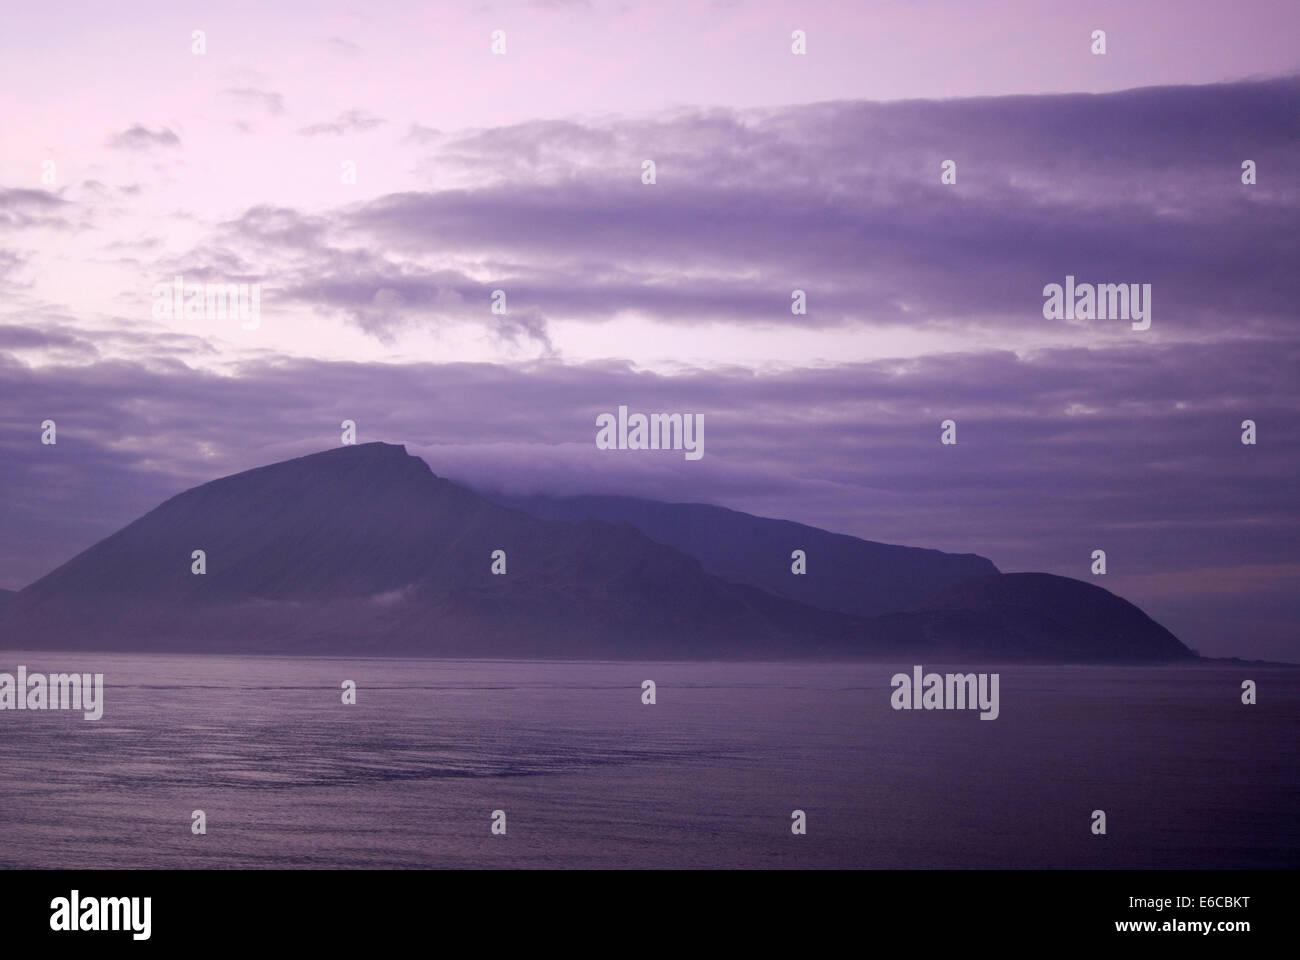 Sunrise on the volcanic island of Punta Vicente Roca / Isabela Island, Galapagos Islands, Ecuador, South America - Stock Image